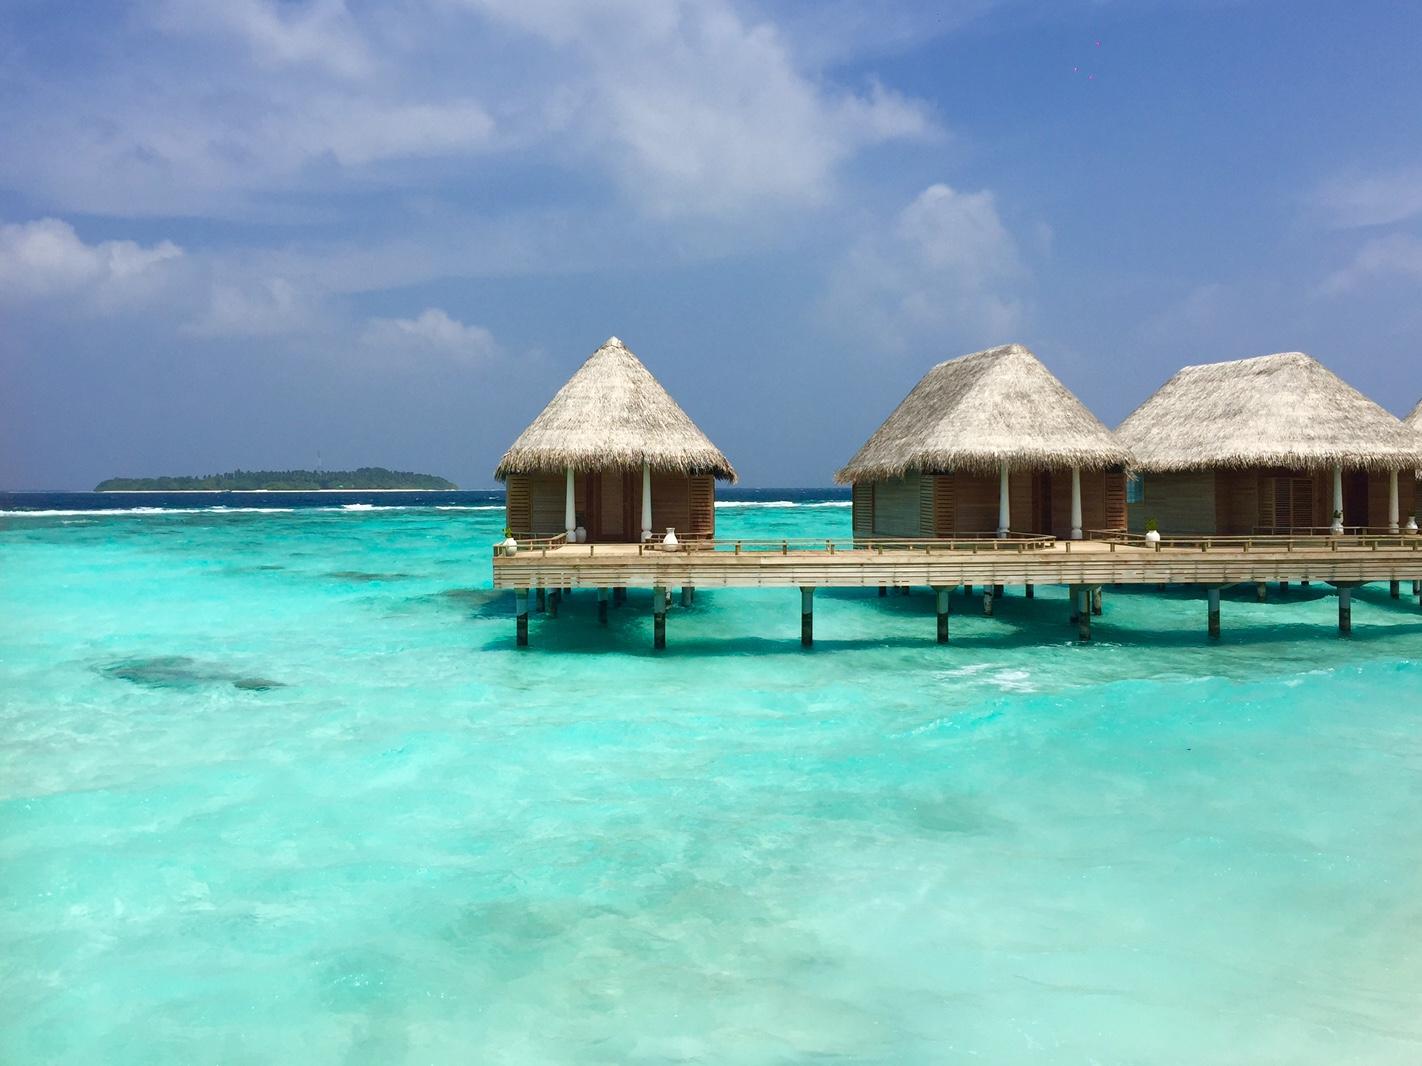 Malediven    die neue Trauminsel Milaidhoo im Baa Atoll strand sonne reisebericht malediven honeymoon 2  TUI Berlin Reisebüro Malediven Milaidhoo Island Spa